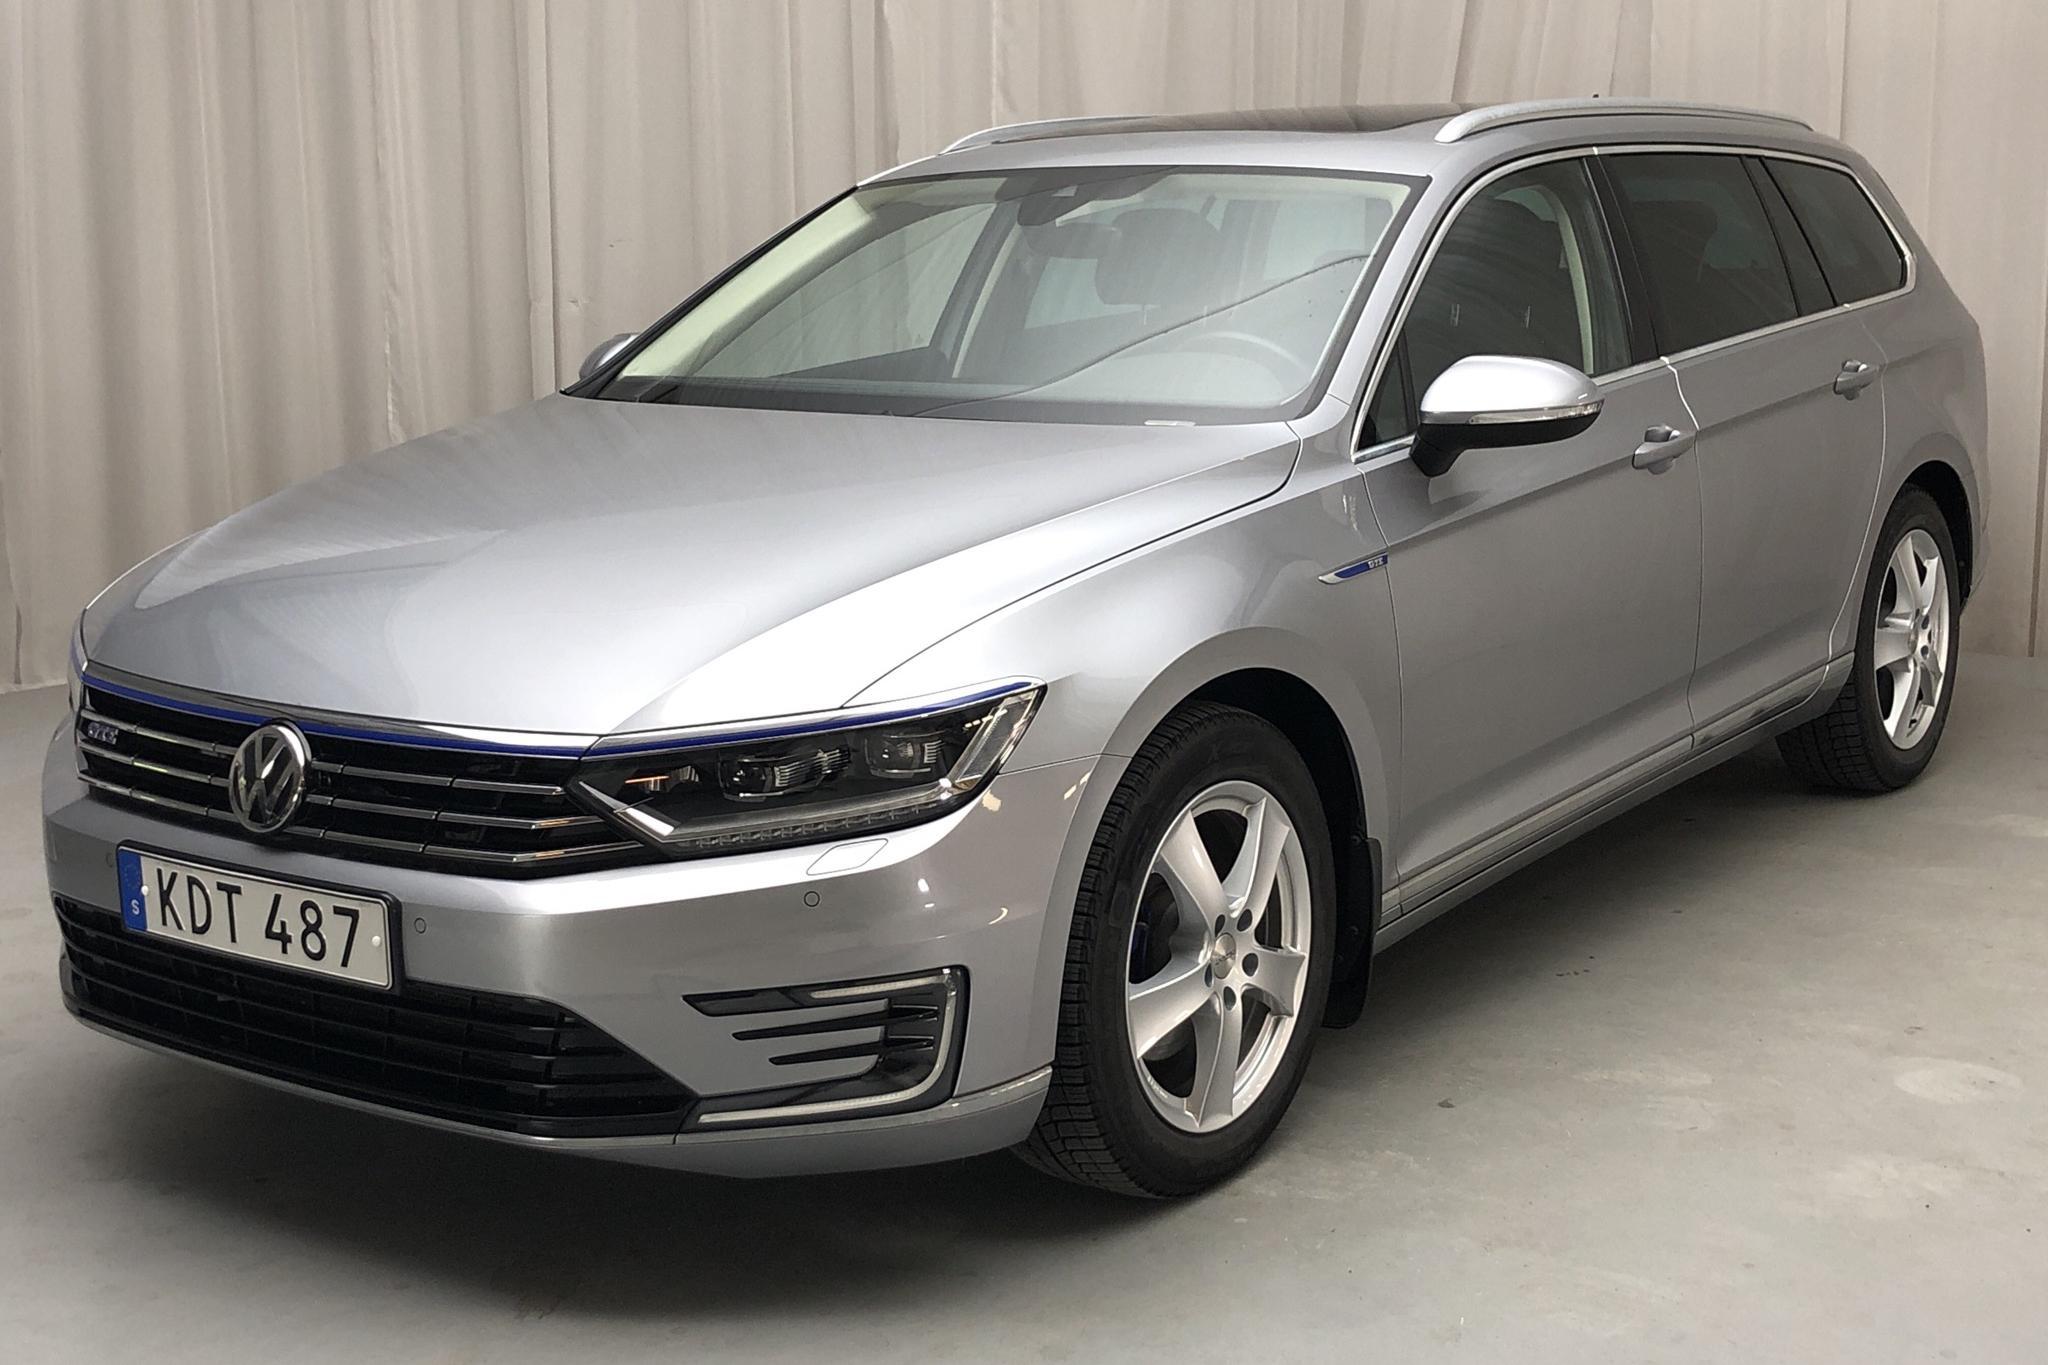 VW Passat 1.4 Plug-in-Hybrid Sportscombi (218hk) - 1 875 mil - Automat - silver - 2018